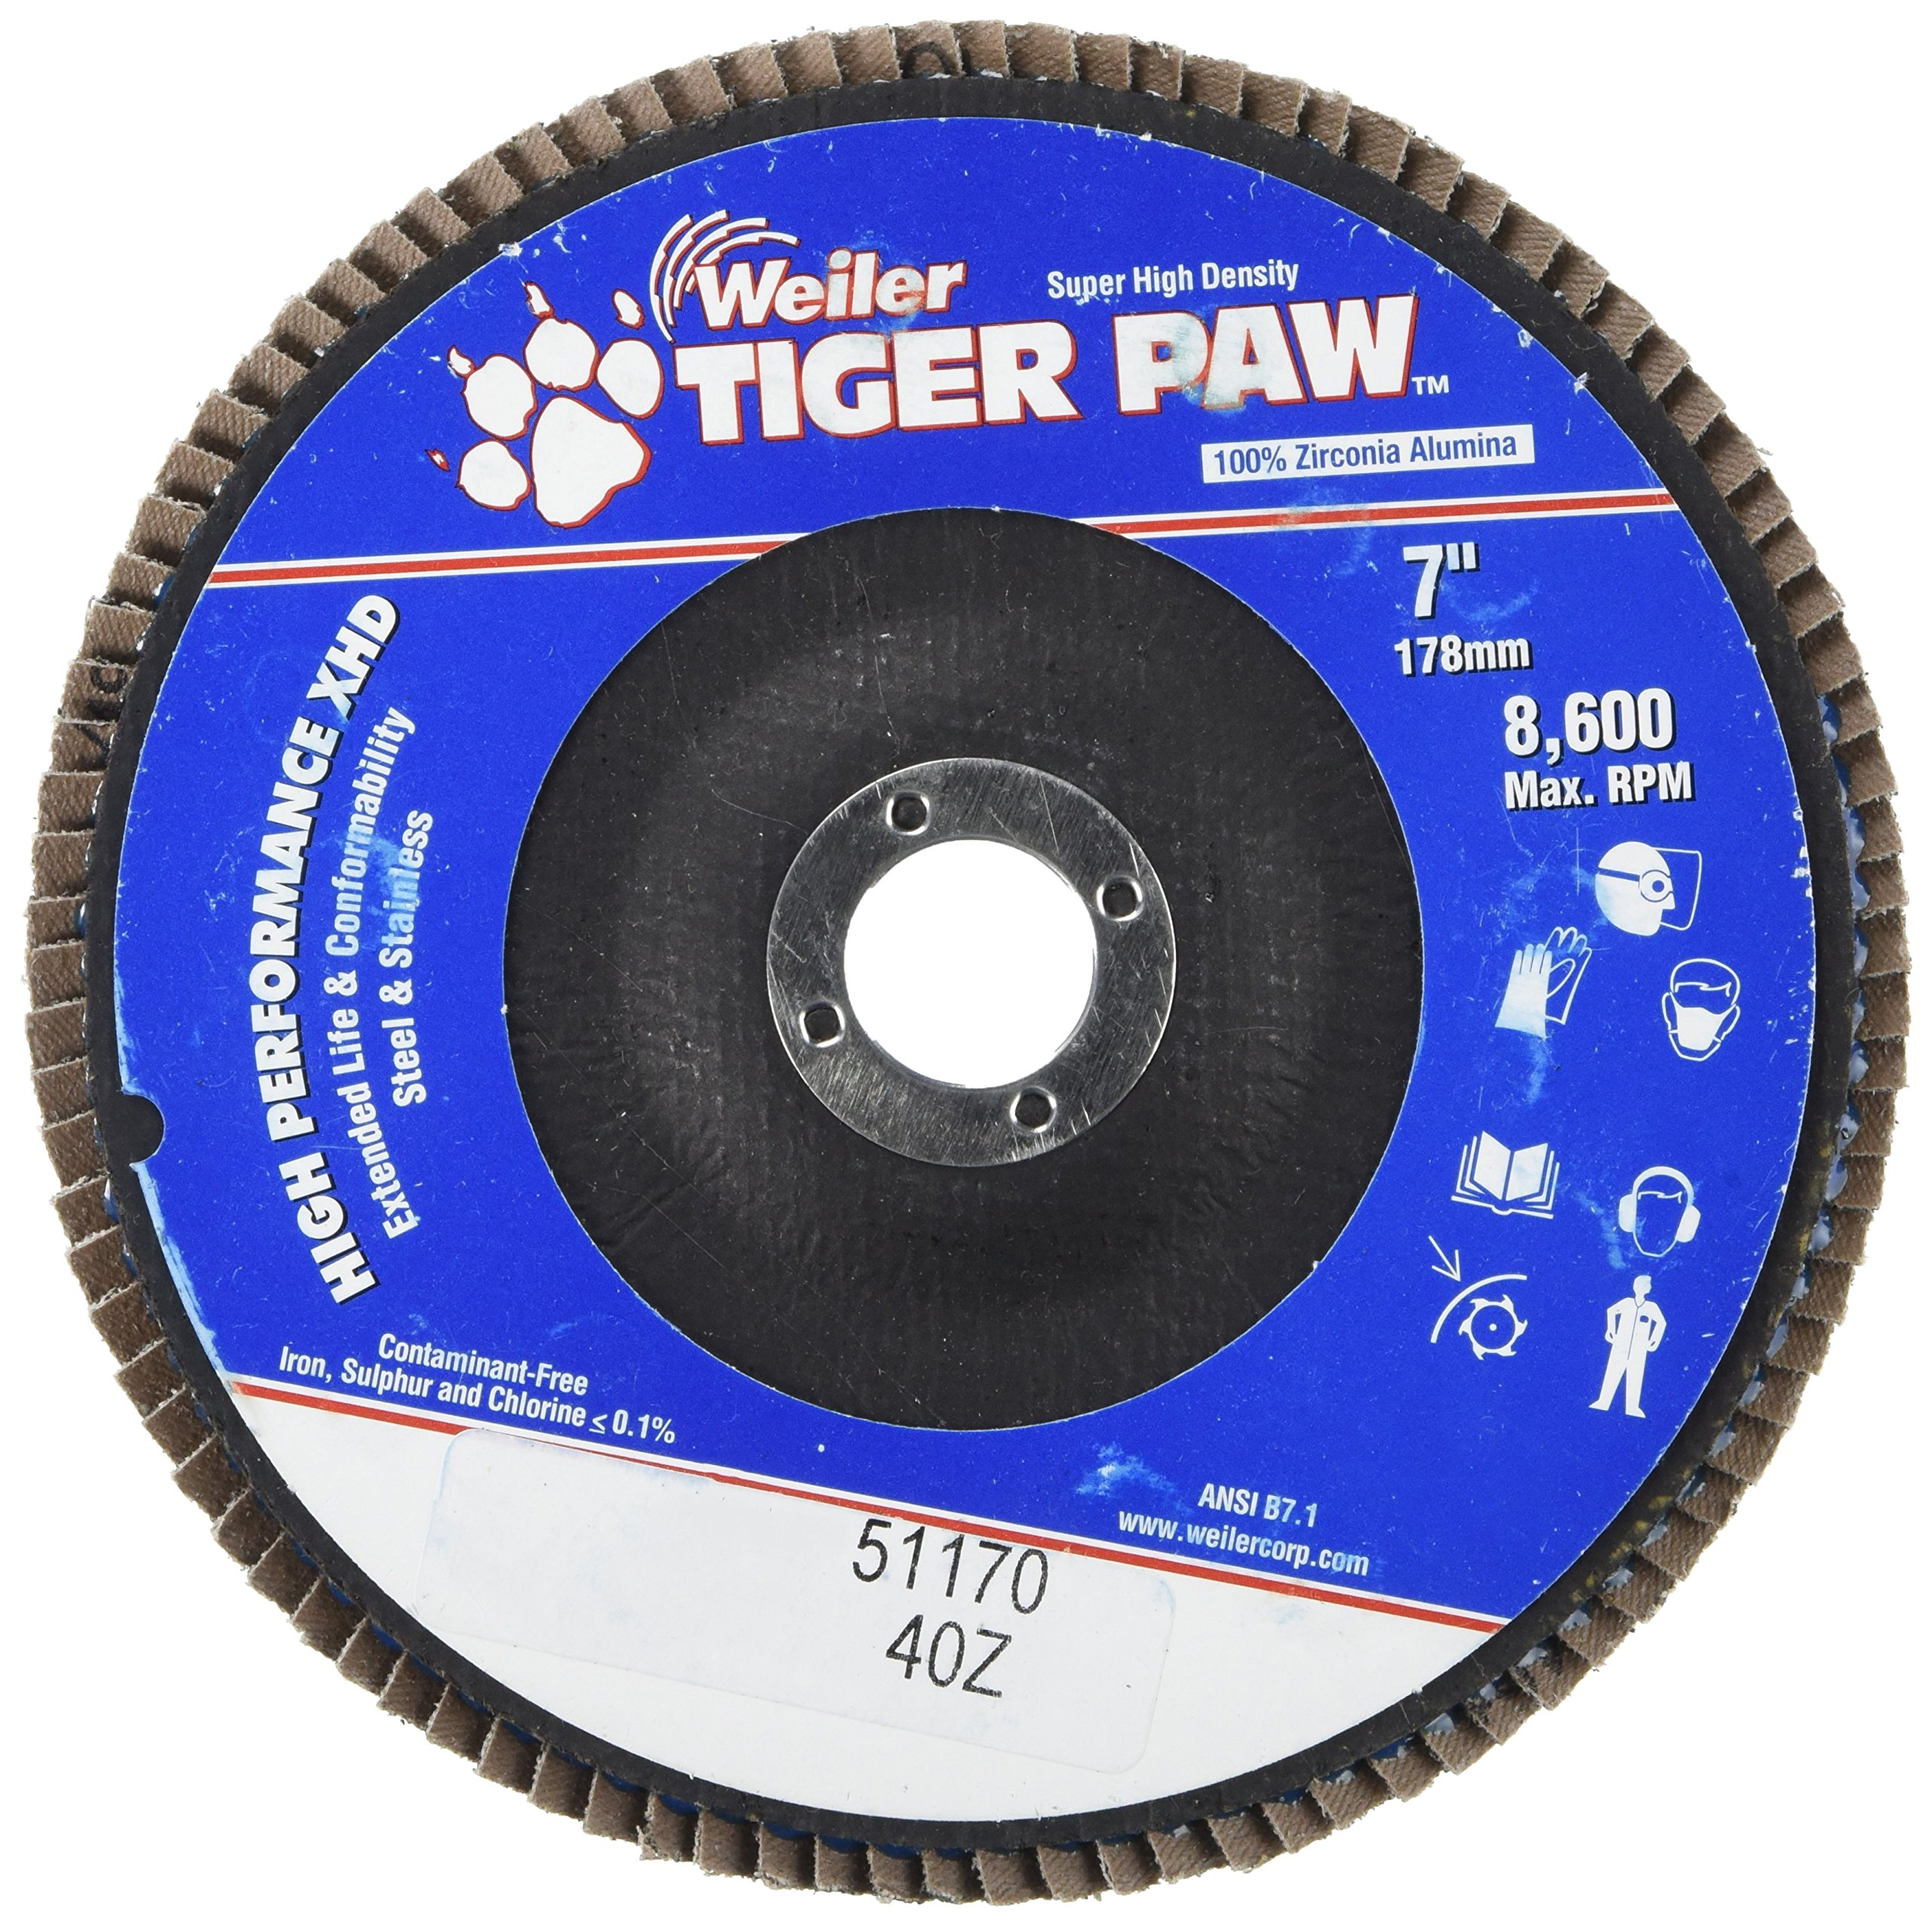 Weiler 51170 Tiger Paw XHD Super High Density Abrasive Flap Disc, Type 27 Flat Style, Phenolic Backing, Zirconia Alumina, 7'' Diameter, 7/8'' Arbor, 40 Grit, 8600 RPM (Pack of 10)